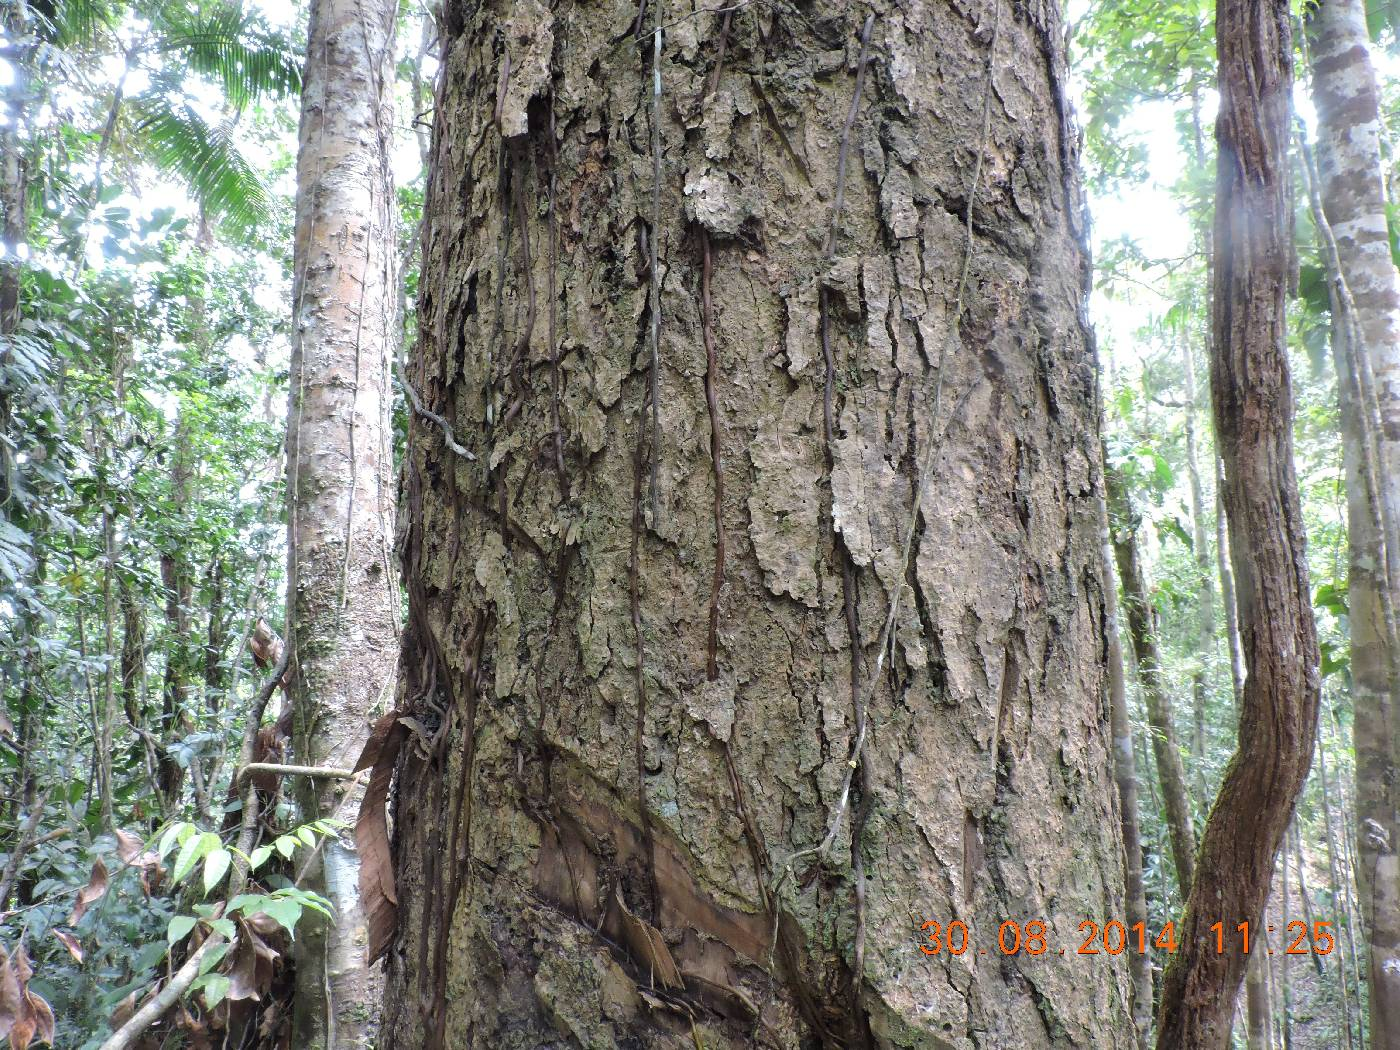 Magnolia poasana image